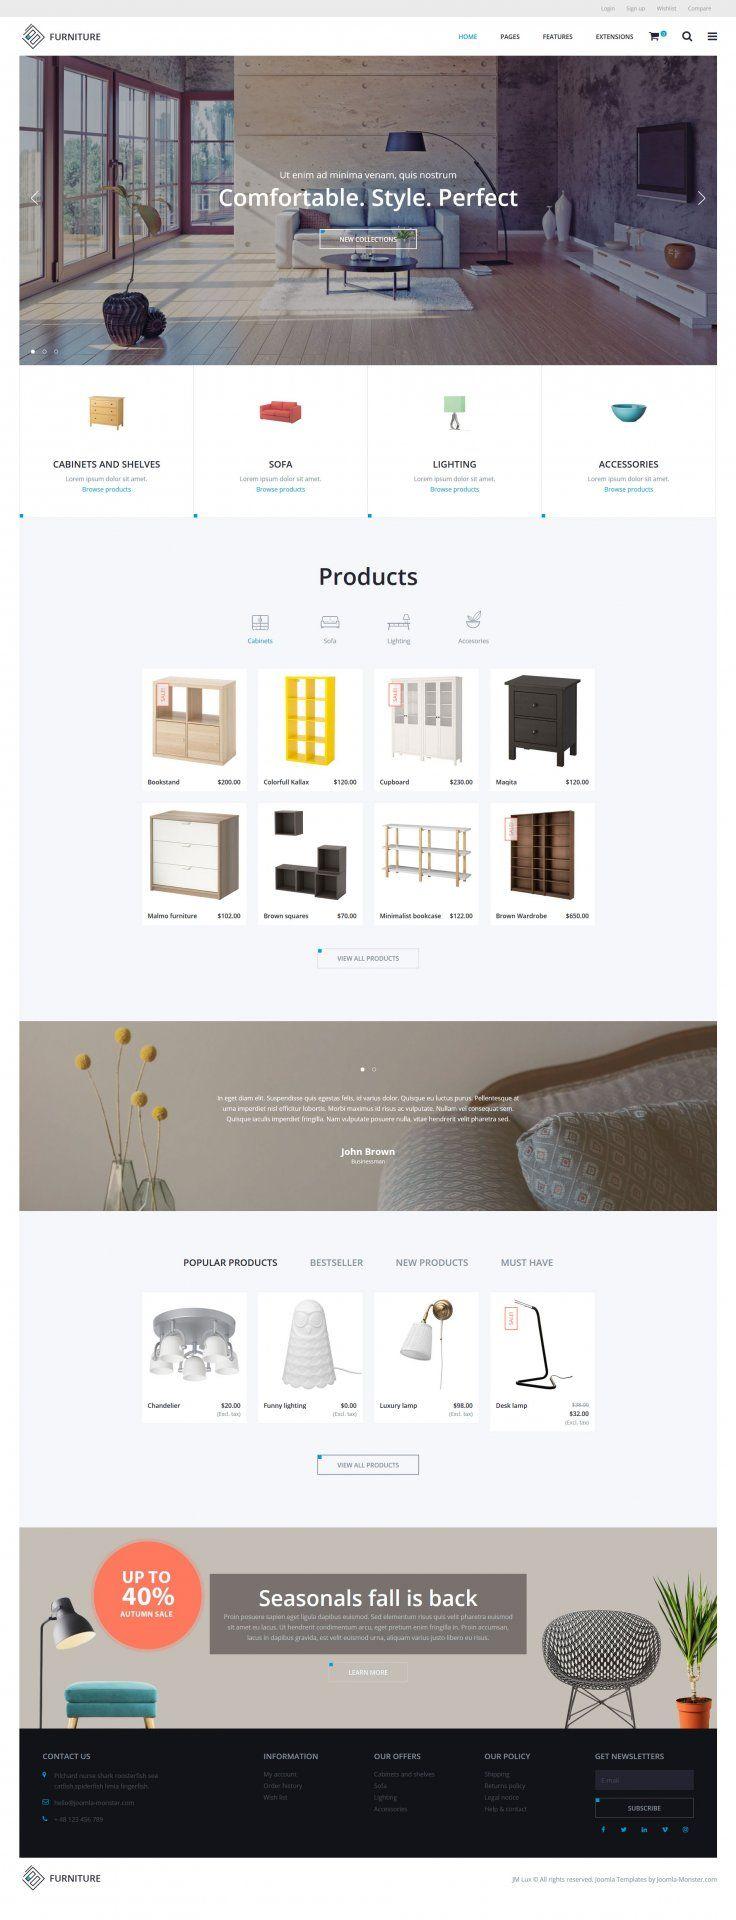 JM Lux - modern Joomla Ecommerce template. Alternative homepage example for furniture online store.  #modern #Joomla #ecommerce #template #furniture #decor #store  https://www.joomla-monster.com/joomla-templates/i/22-ecommerce/244-jm-lux